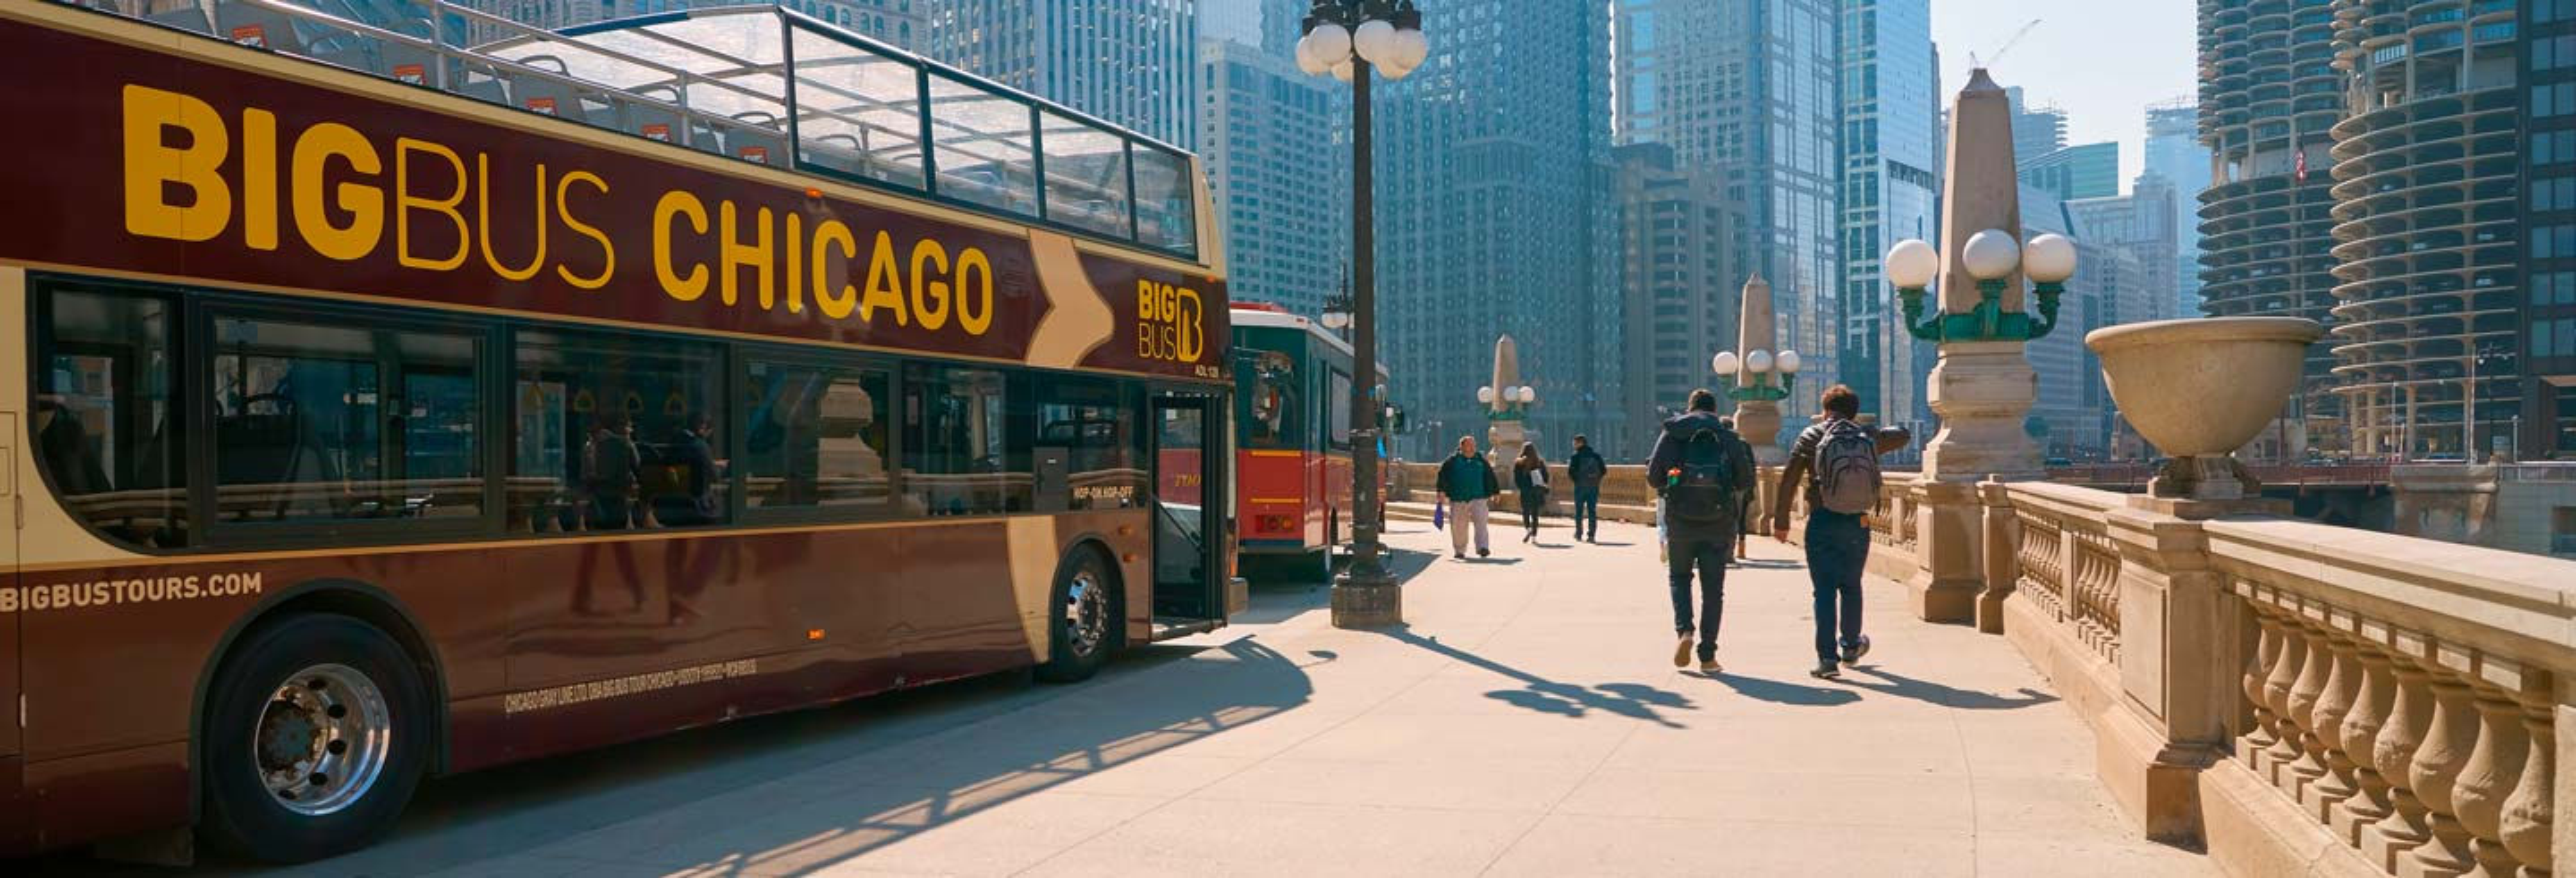 Chicago Tourist Bus